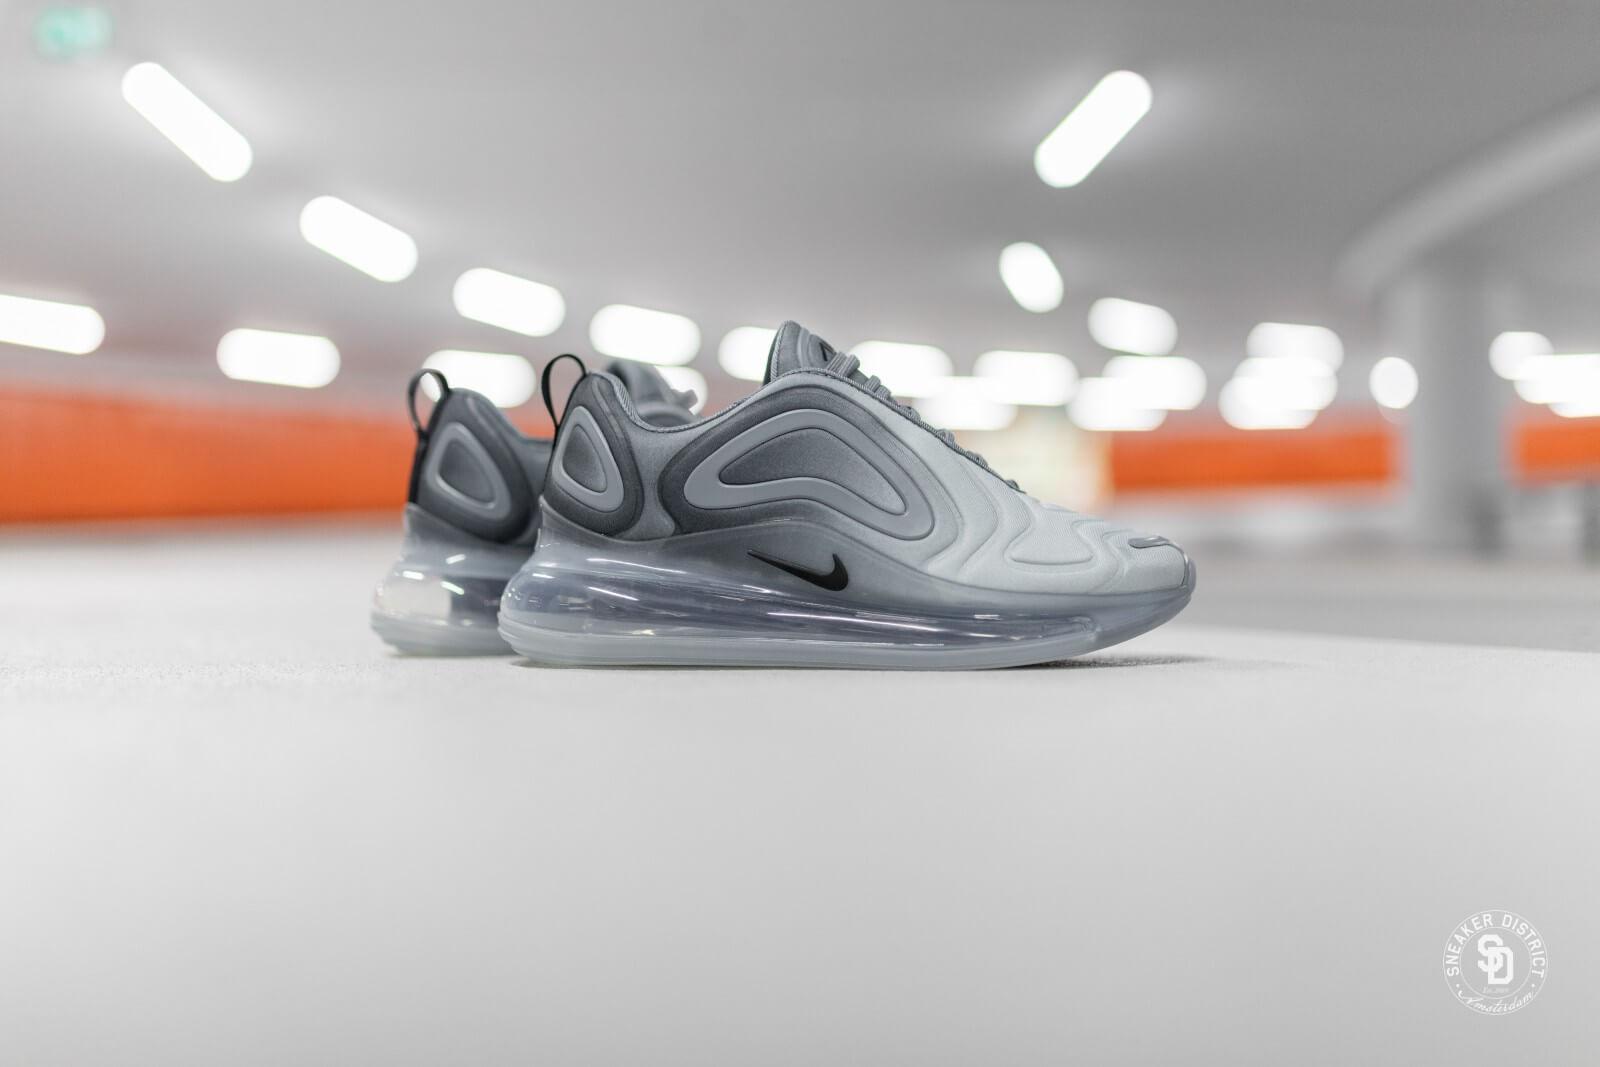 Nike Air Max 720 Cool Grey/Black-Wolf Grey